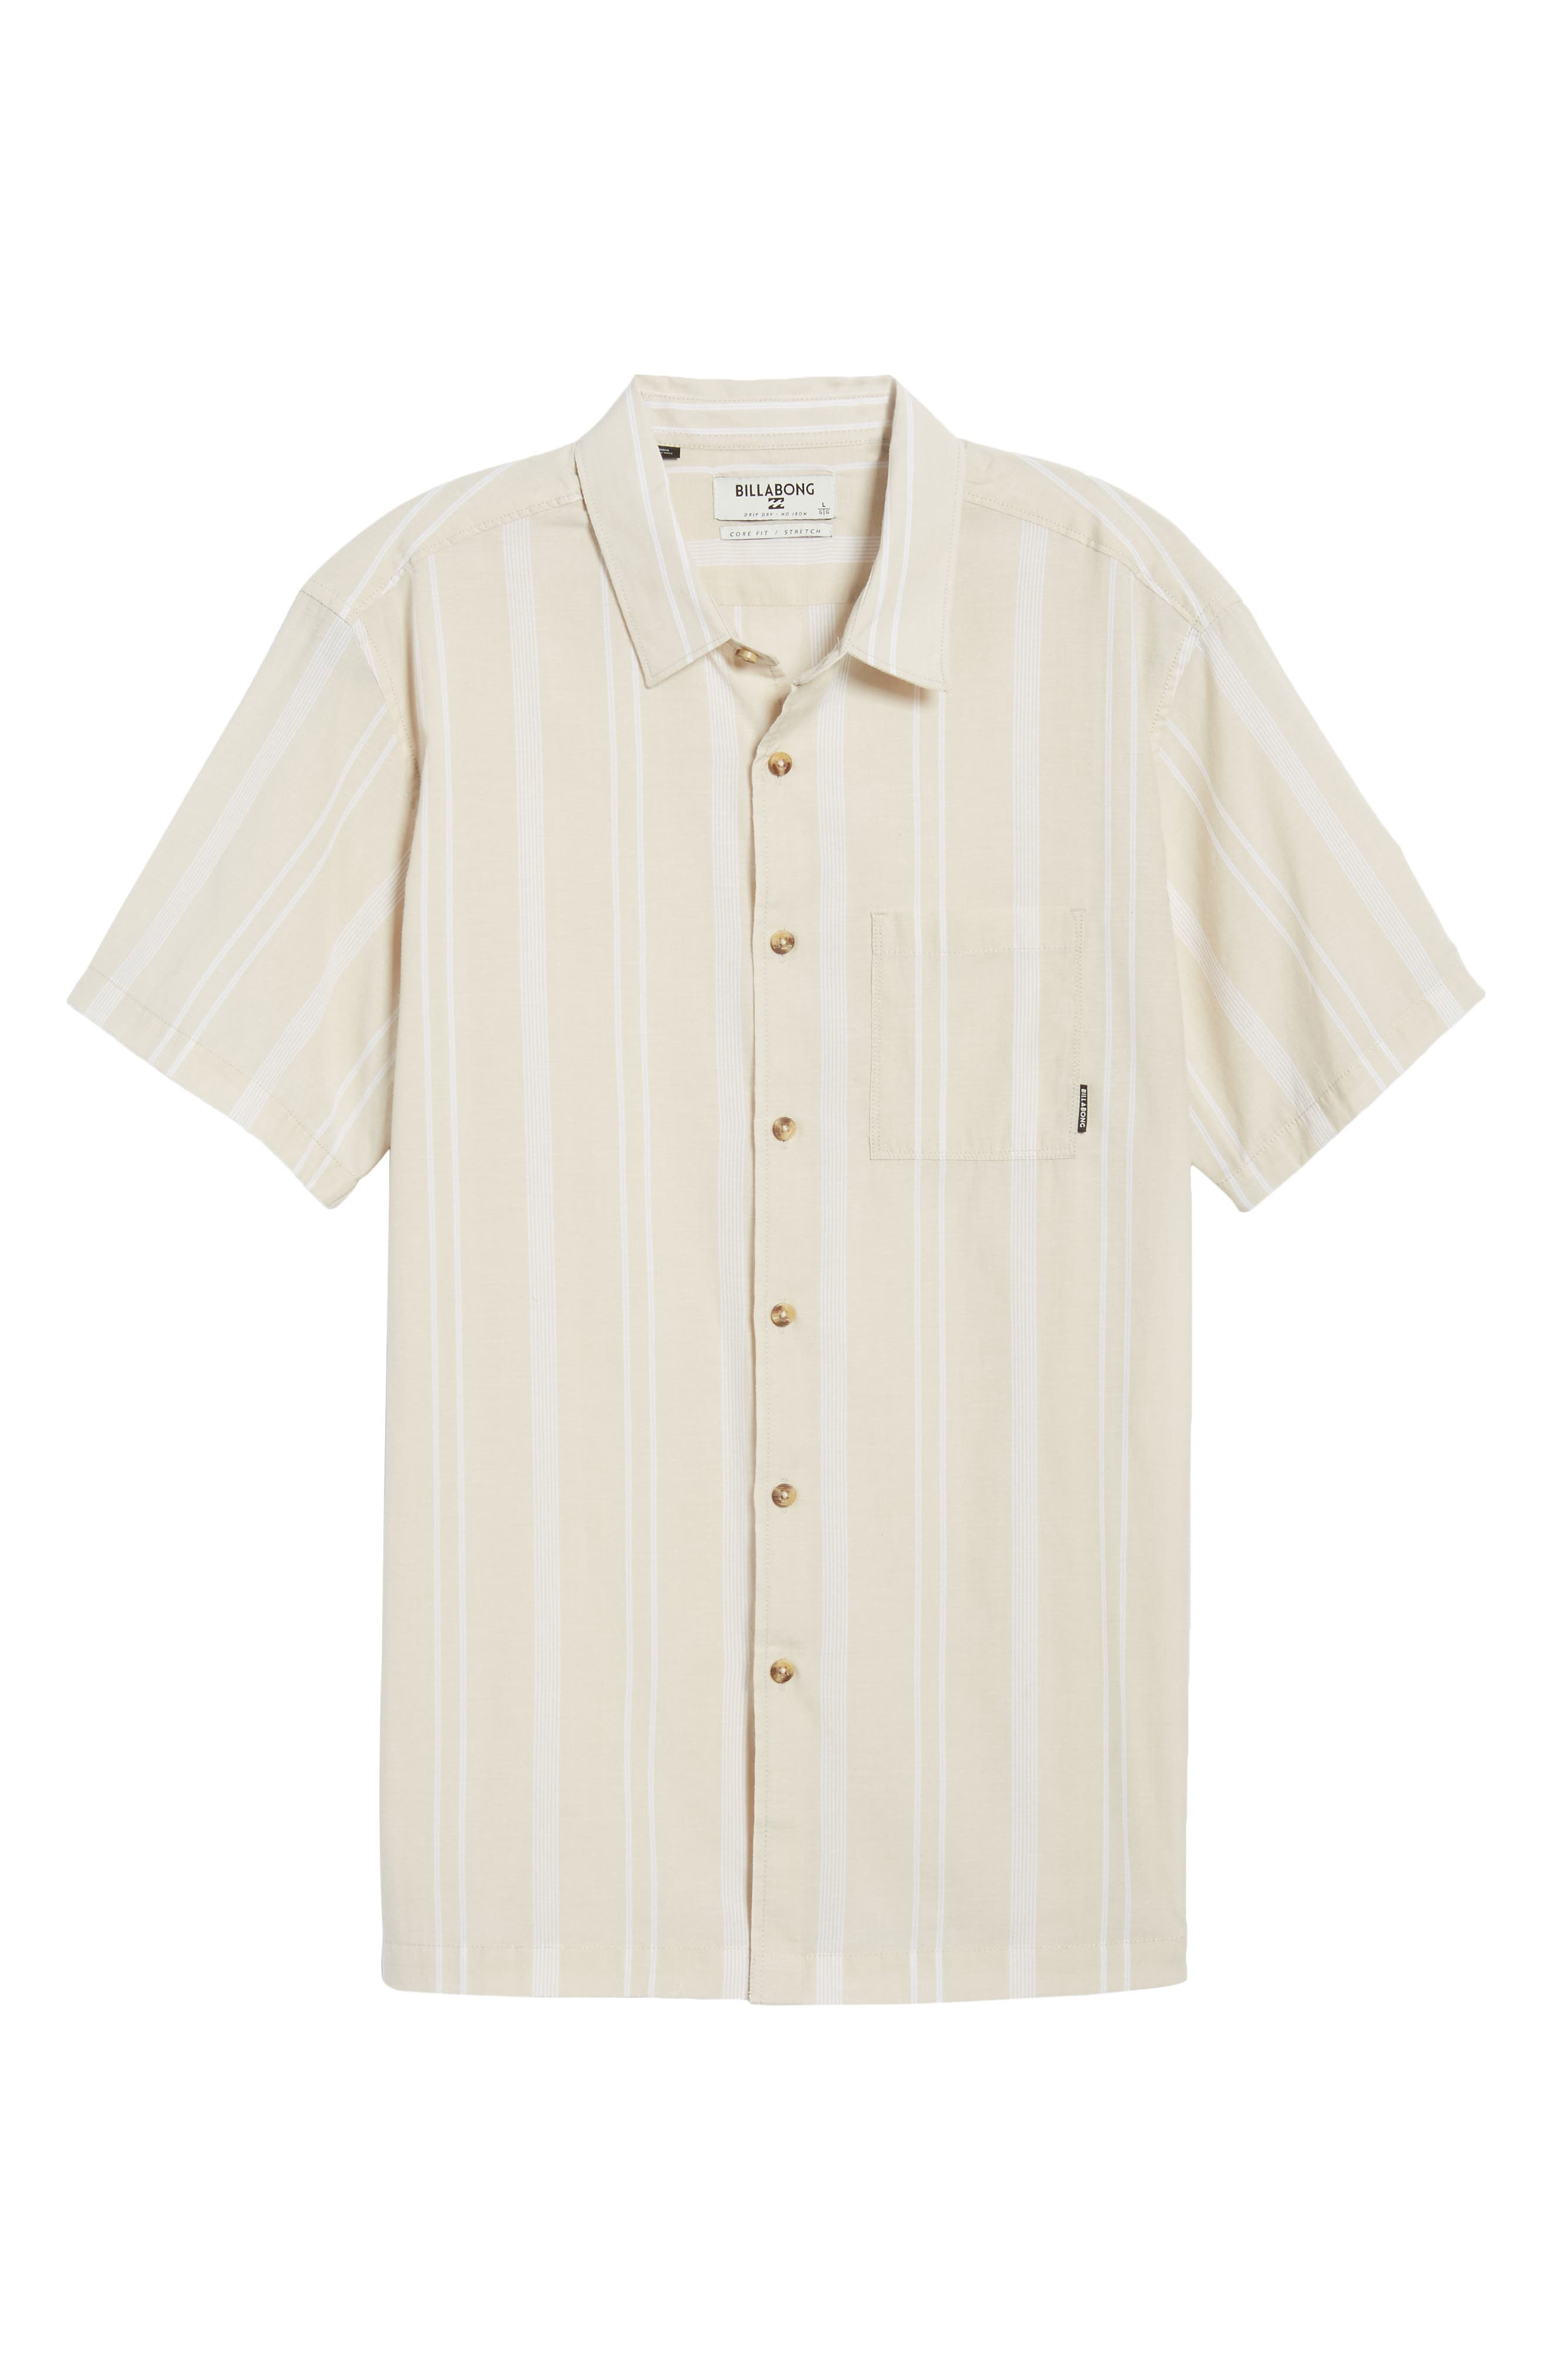 Donny Short Sleeve Shirt,                             Alternate thumbnail 6, color,                             Sand